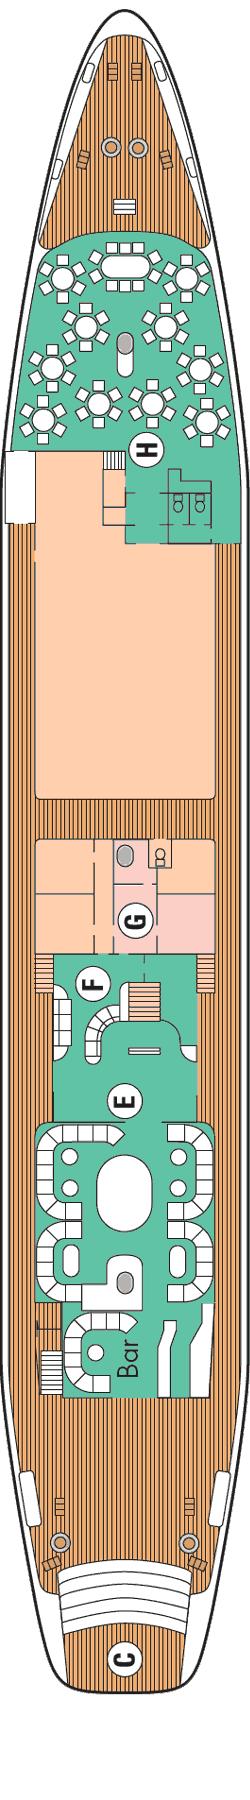 Le Ponant - Deck Saint-Barth